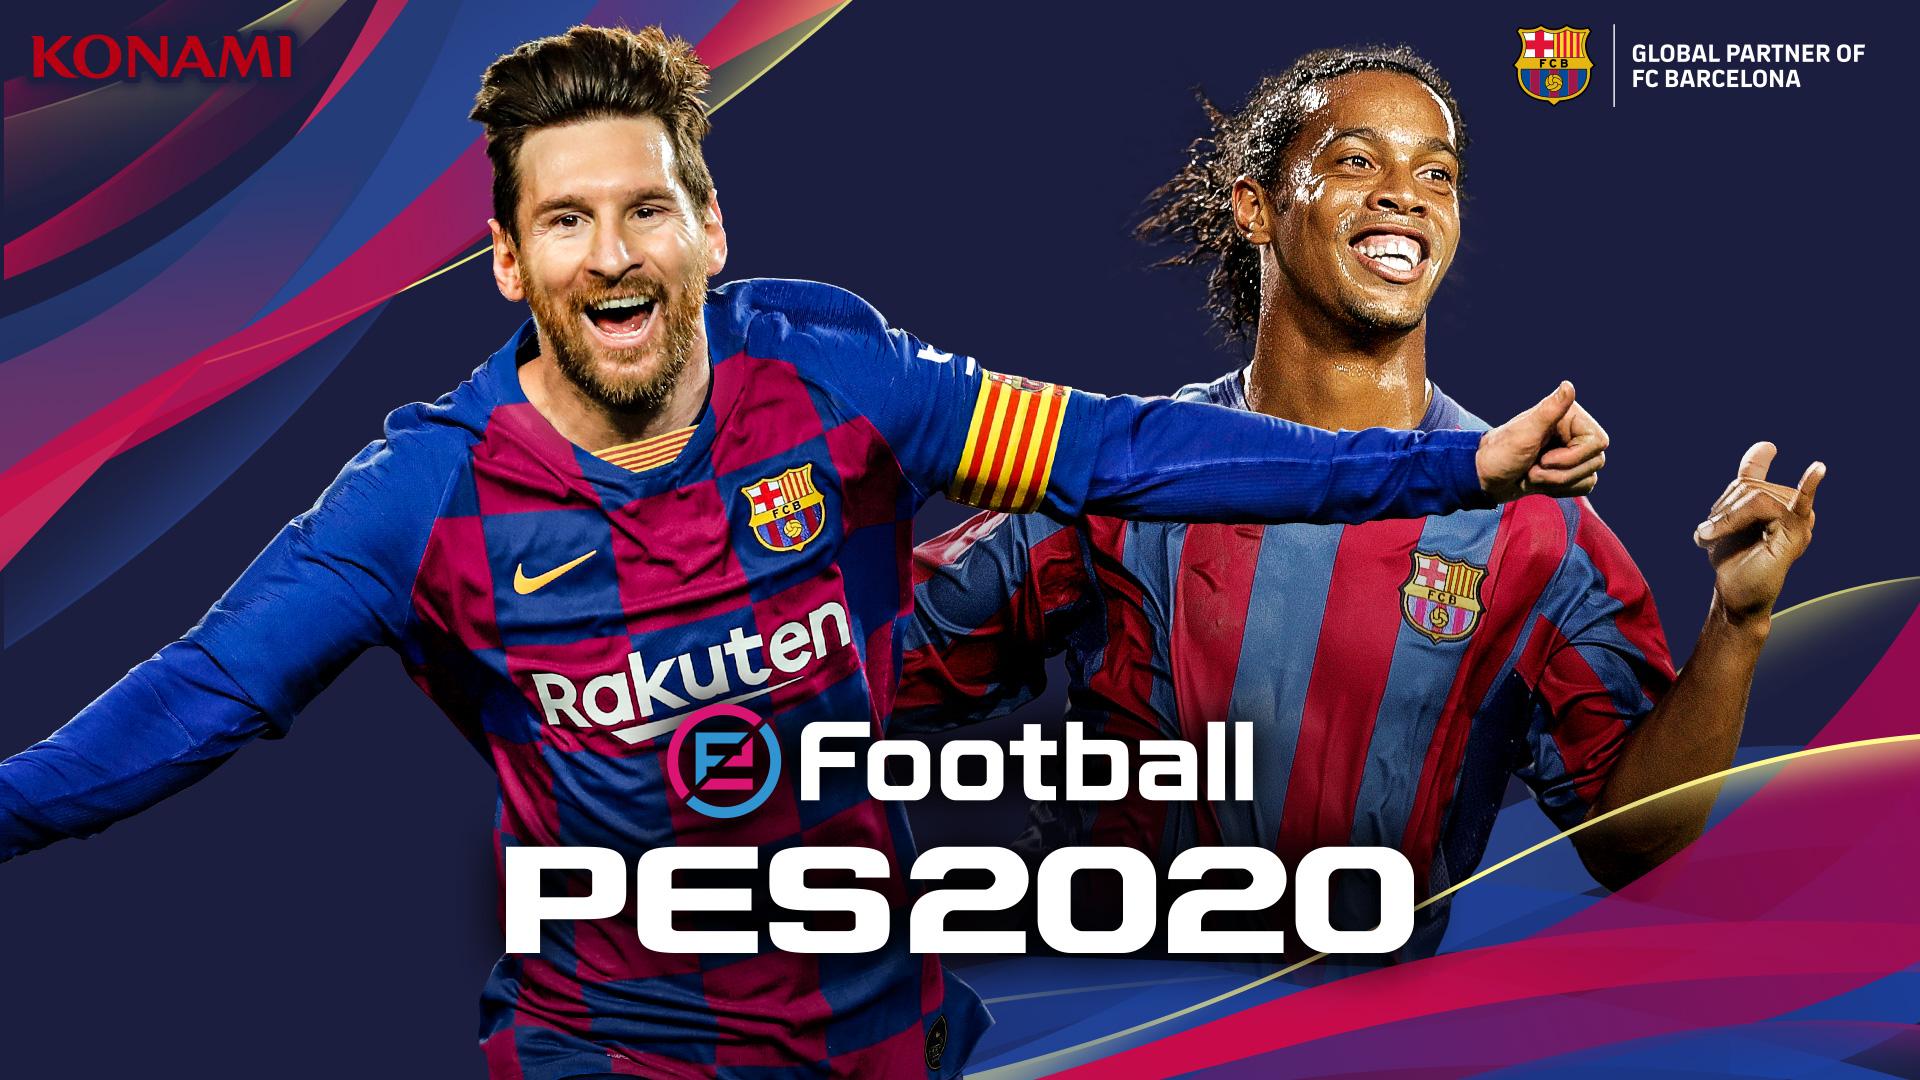 Konami announce the evolution of PES - eFootball PES 2020